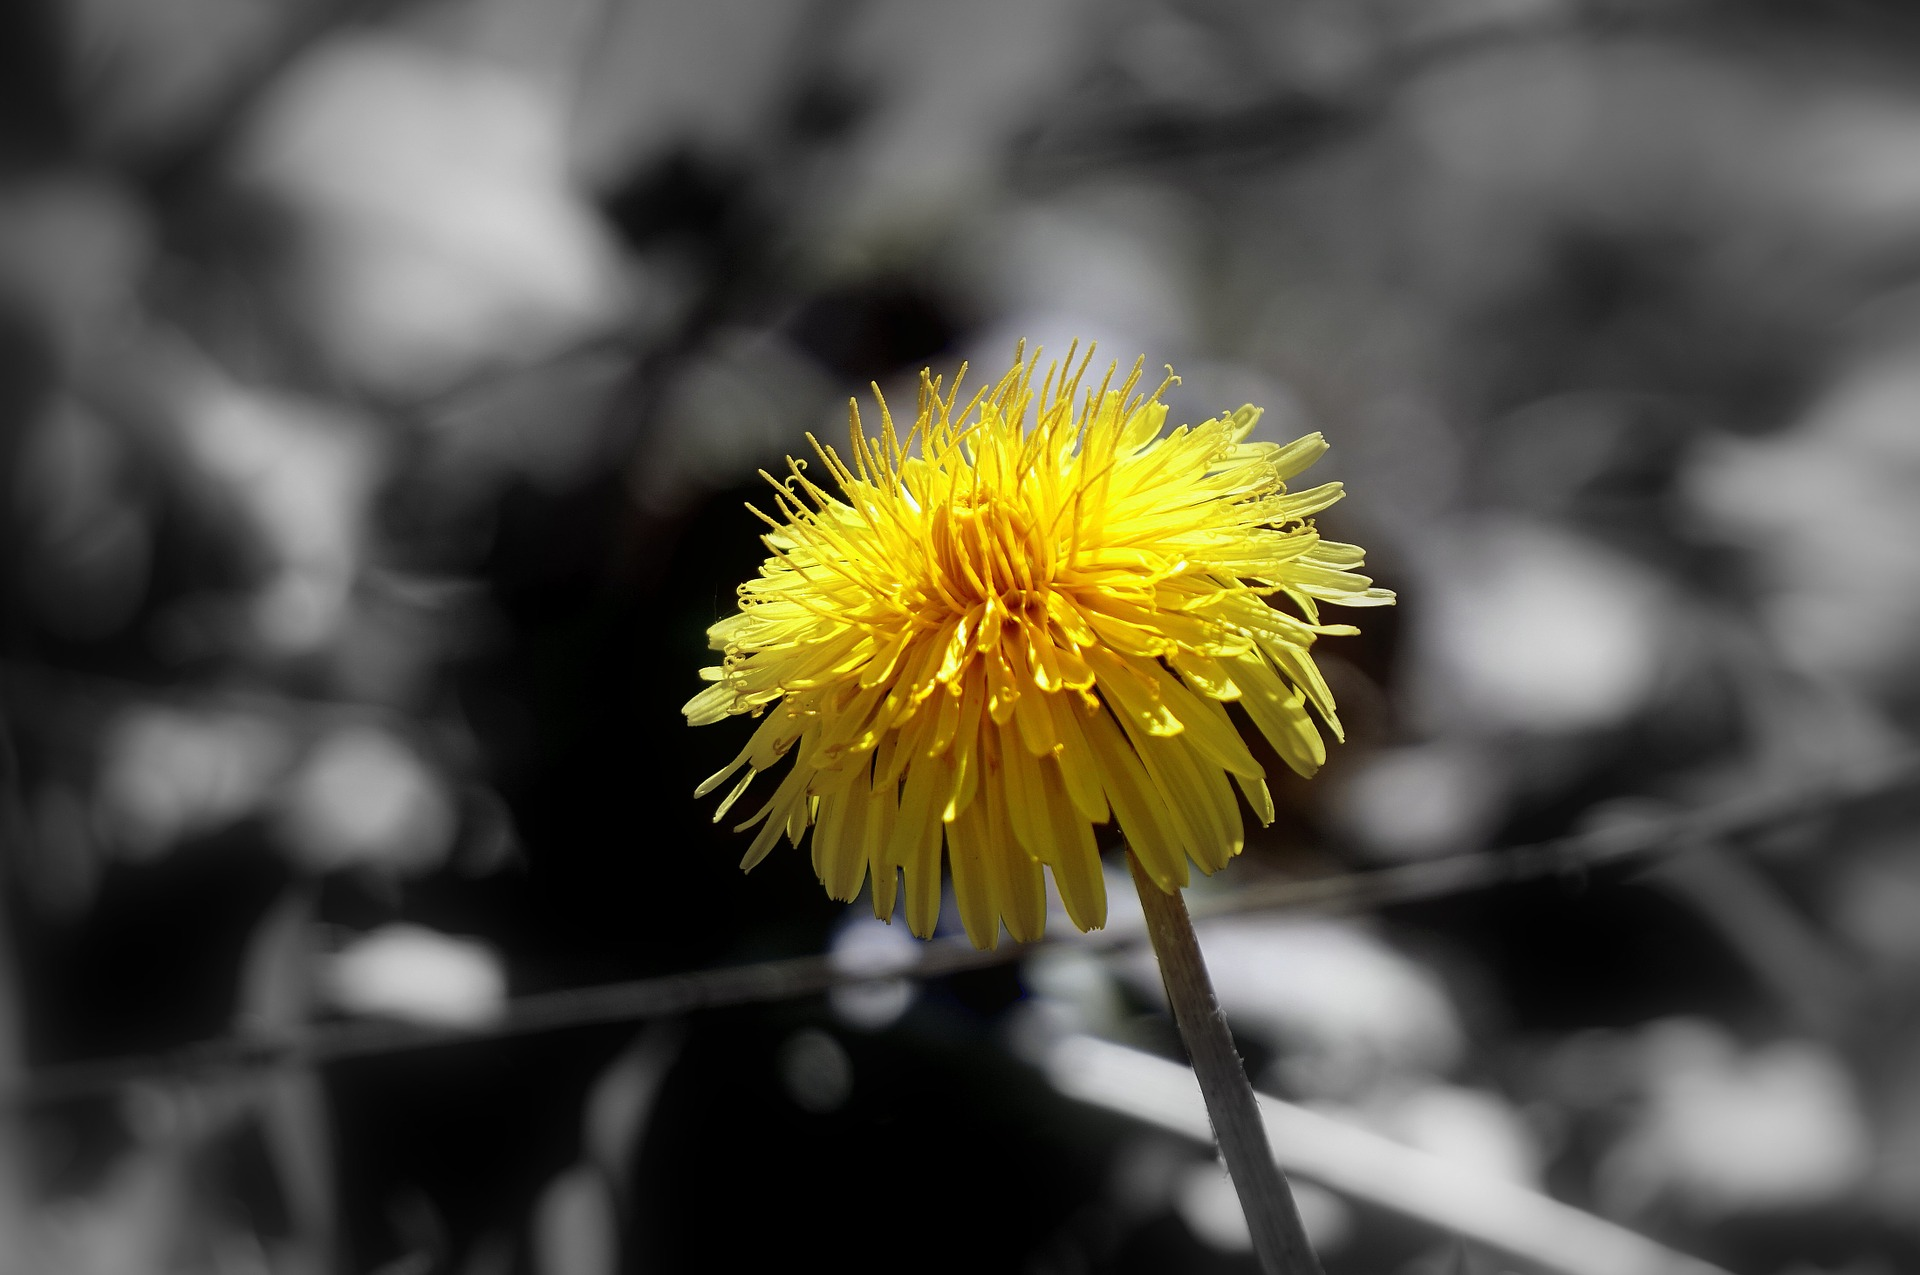 dandelion-1337607_1920